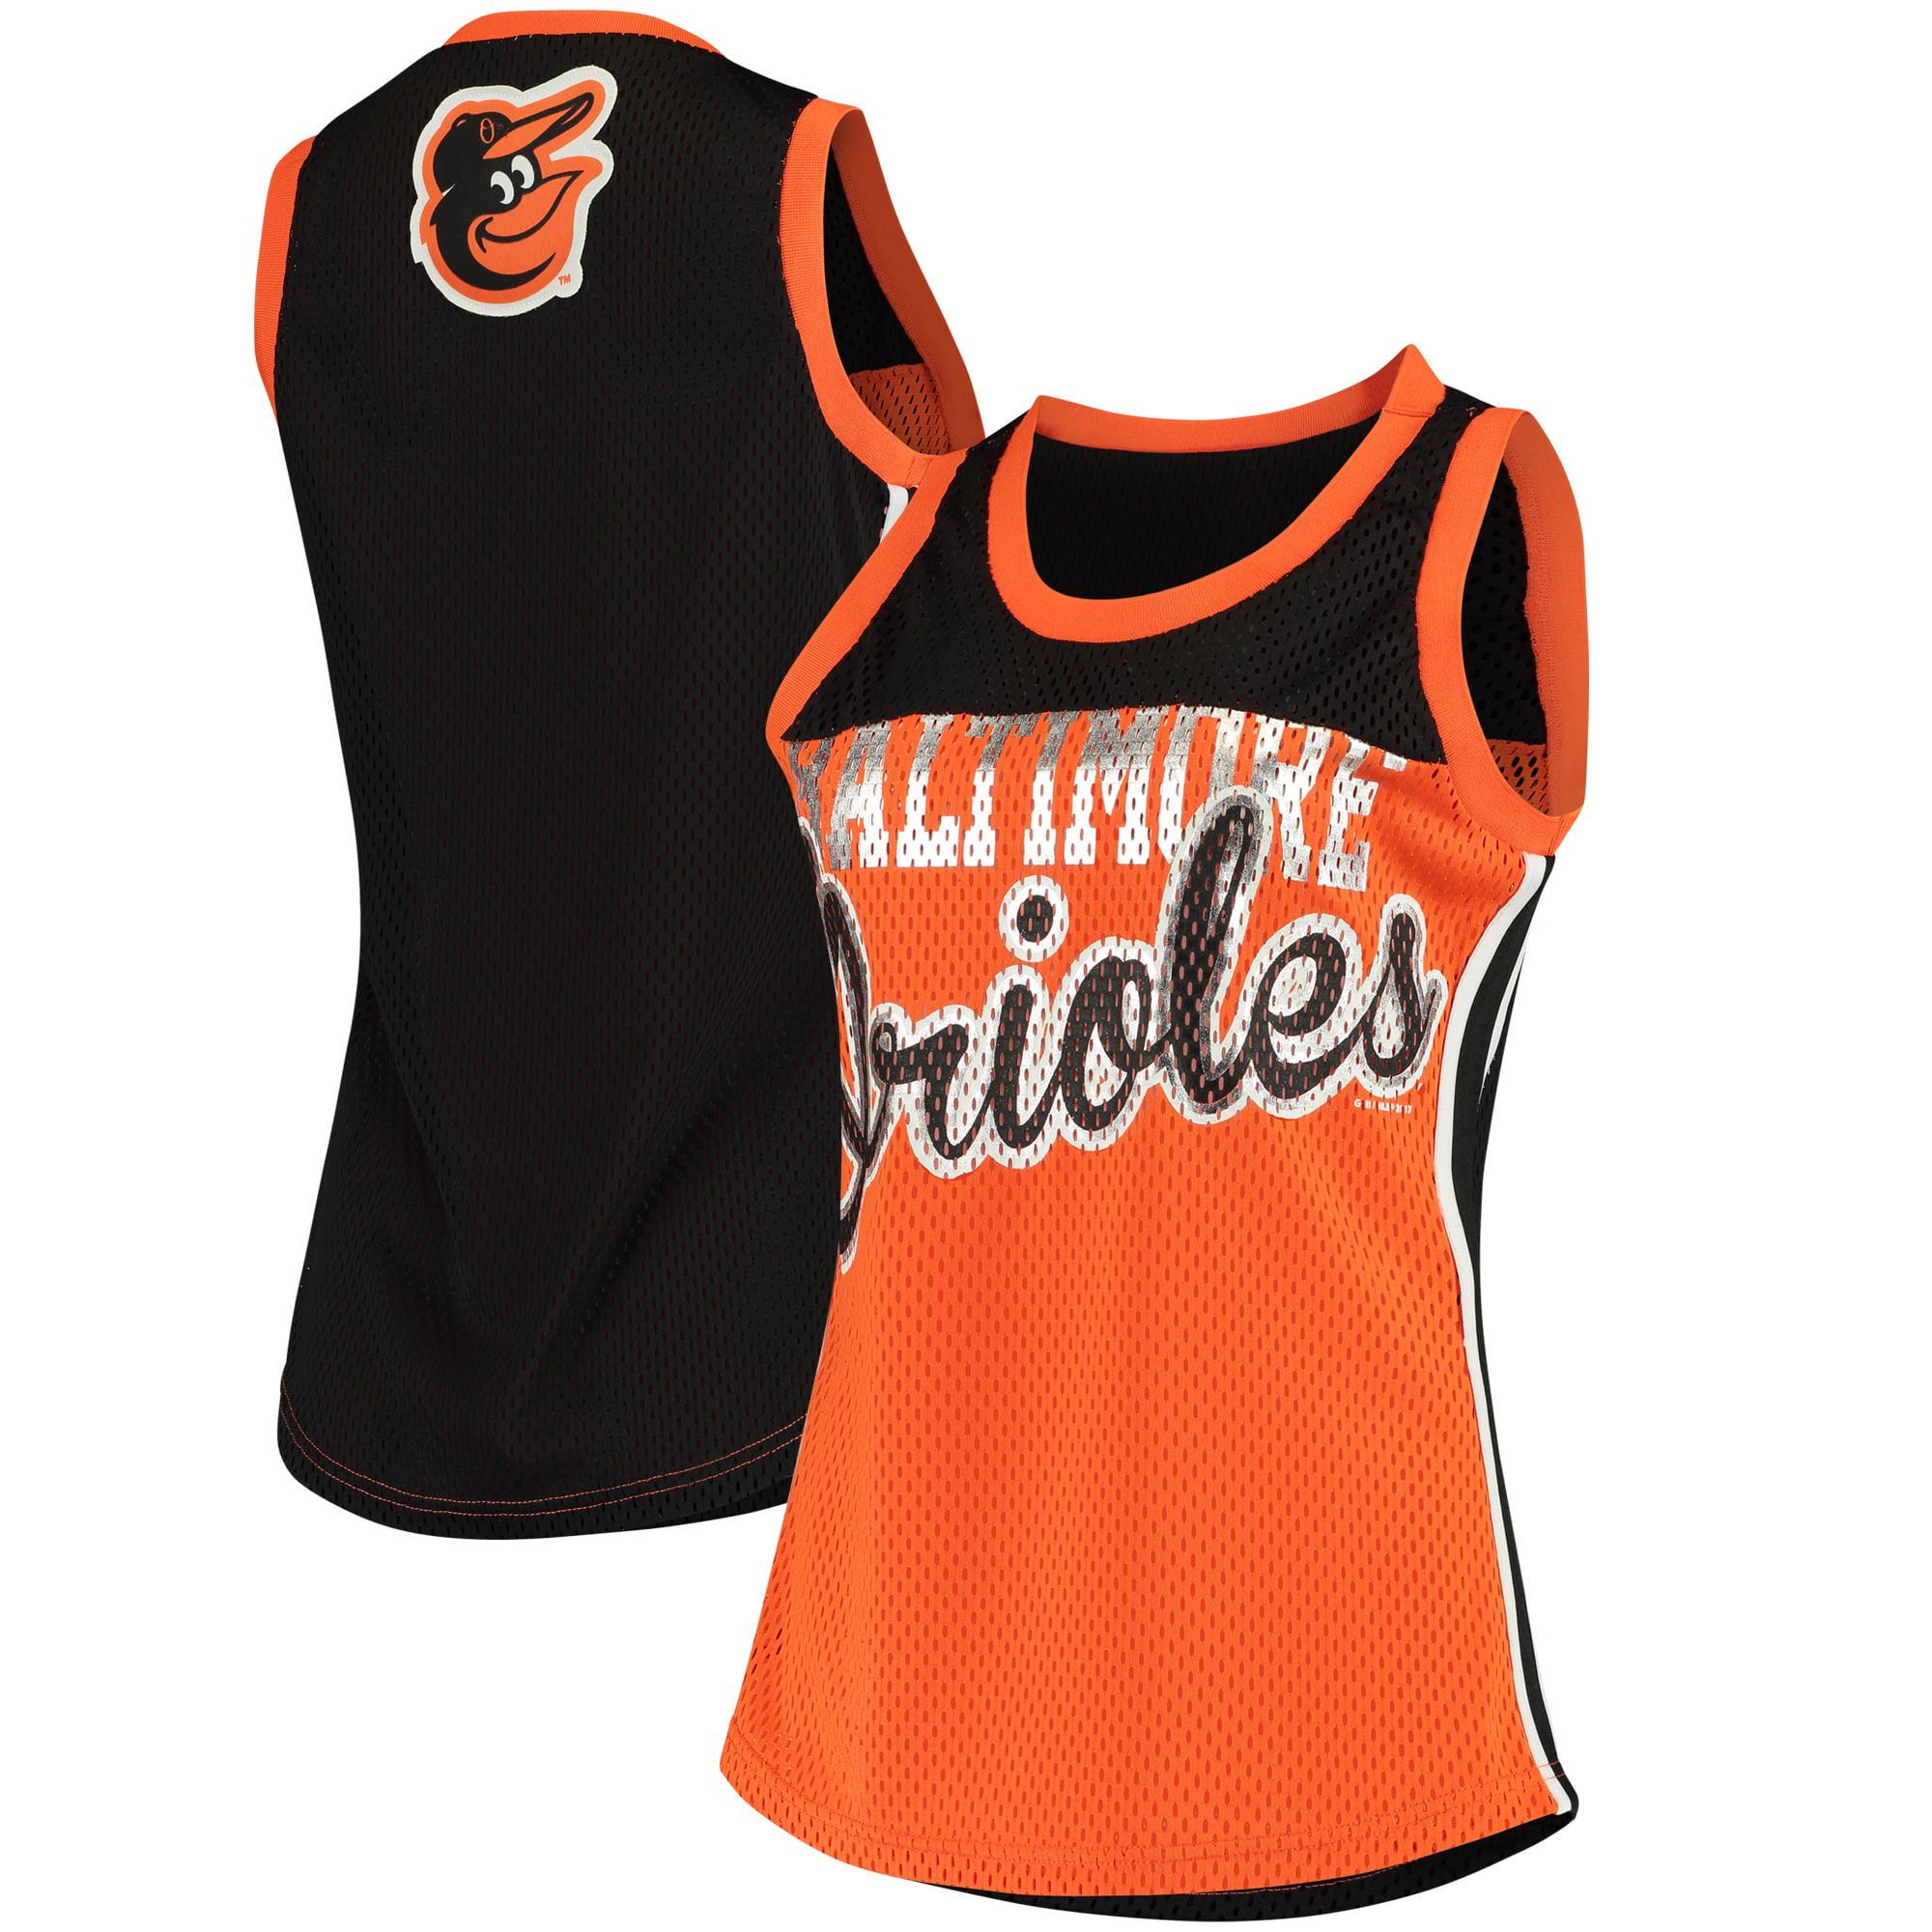 Baltimore Orioles G-III 4Her by Carl Banks Women's Championship Tank Top - Orange/Black